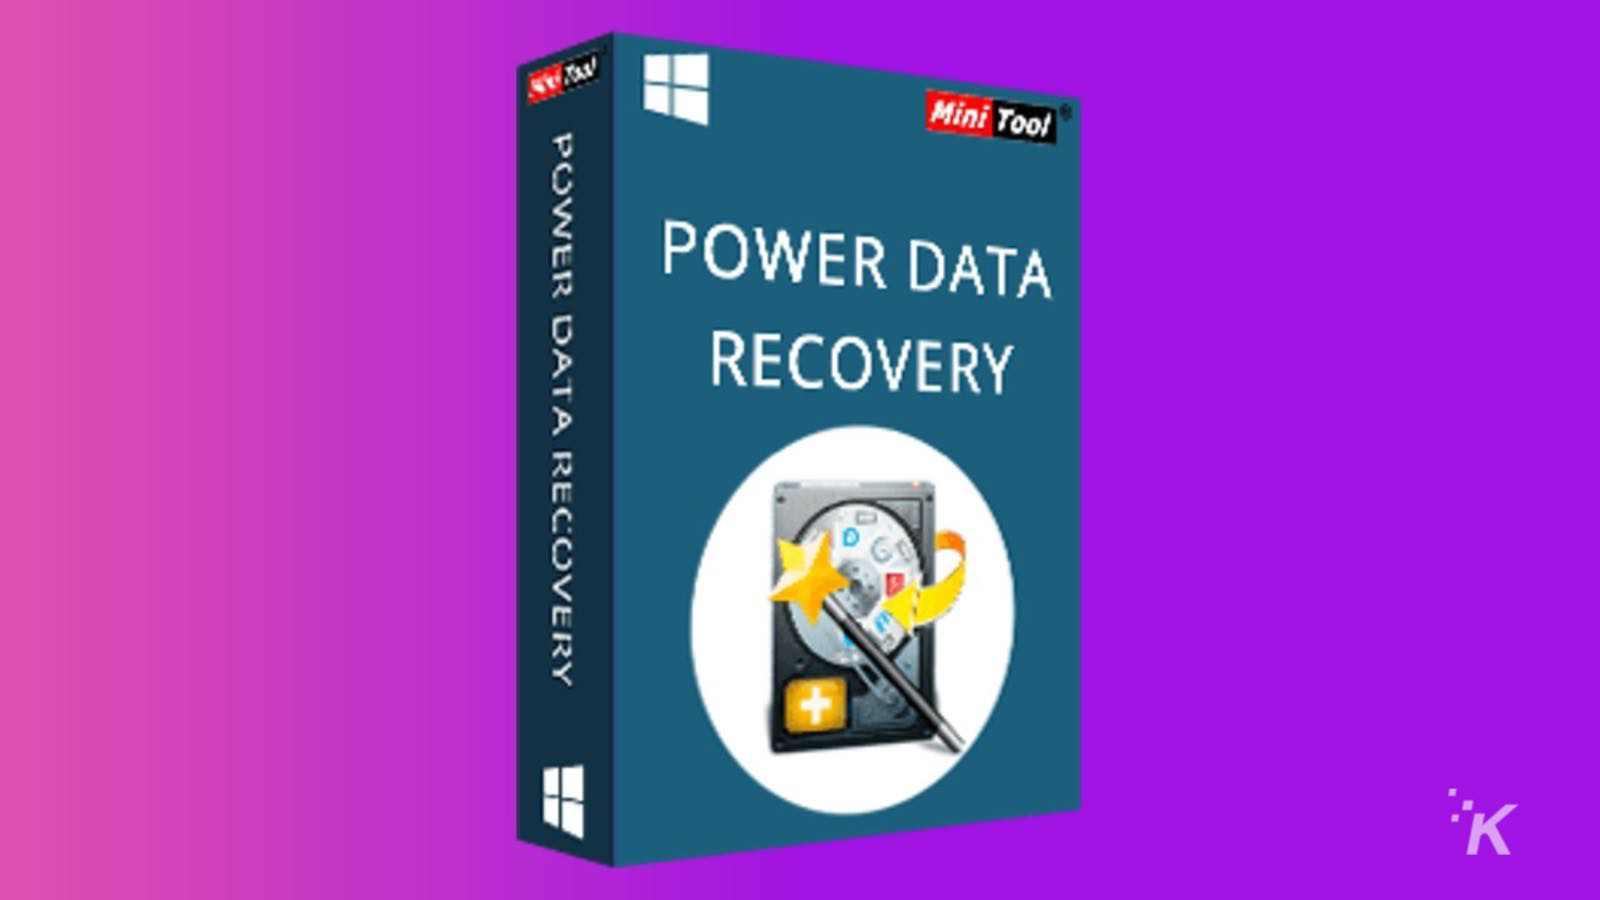 power data recovery mini tool